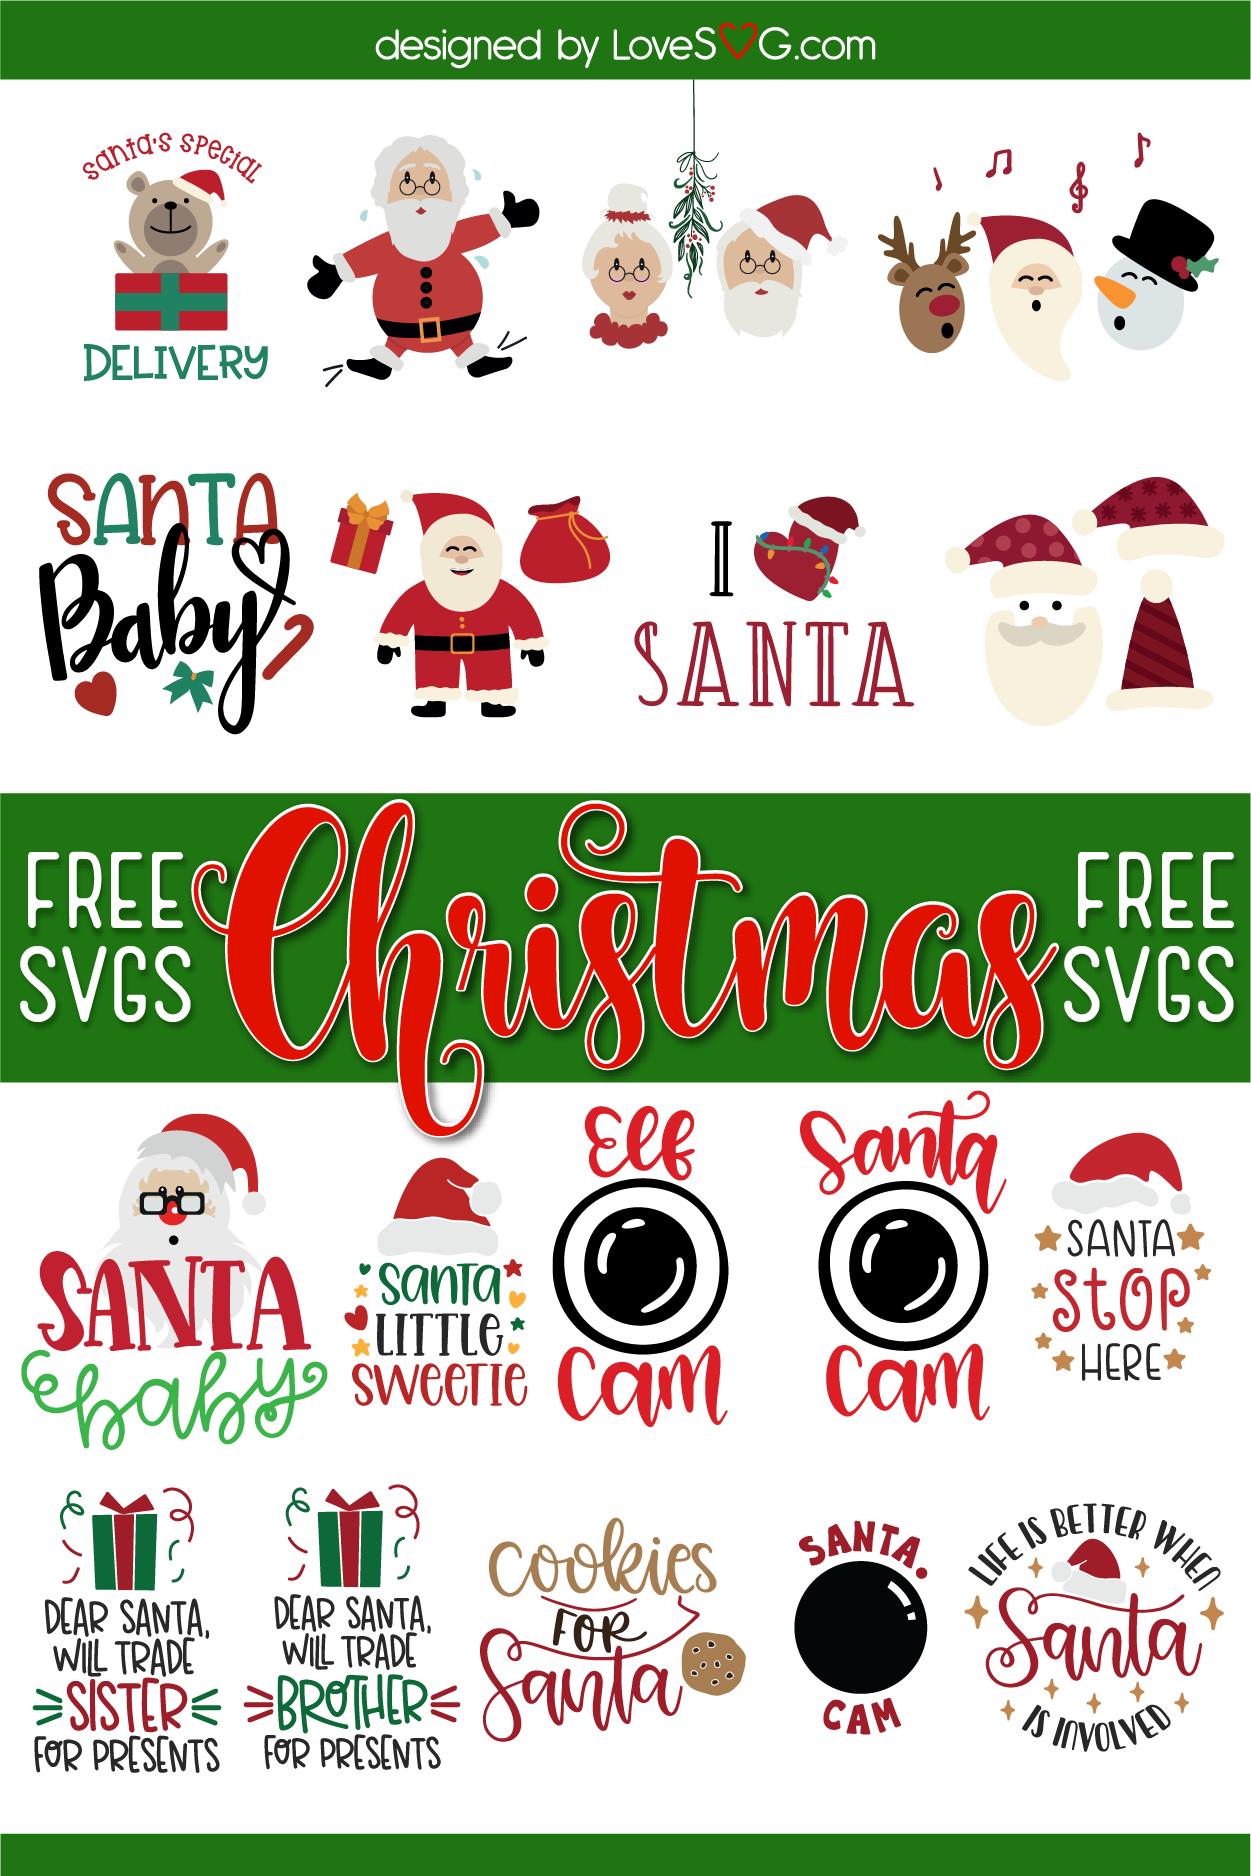 Pin on Free Christmas SVG Cut Files